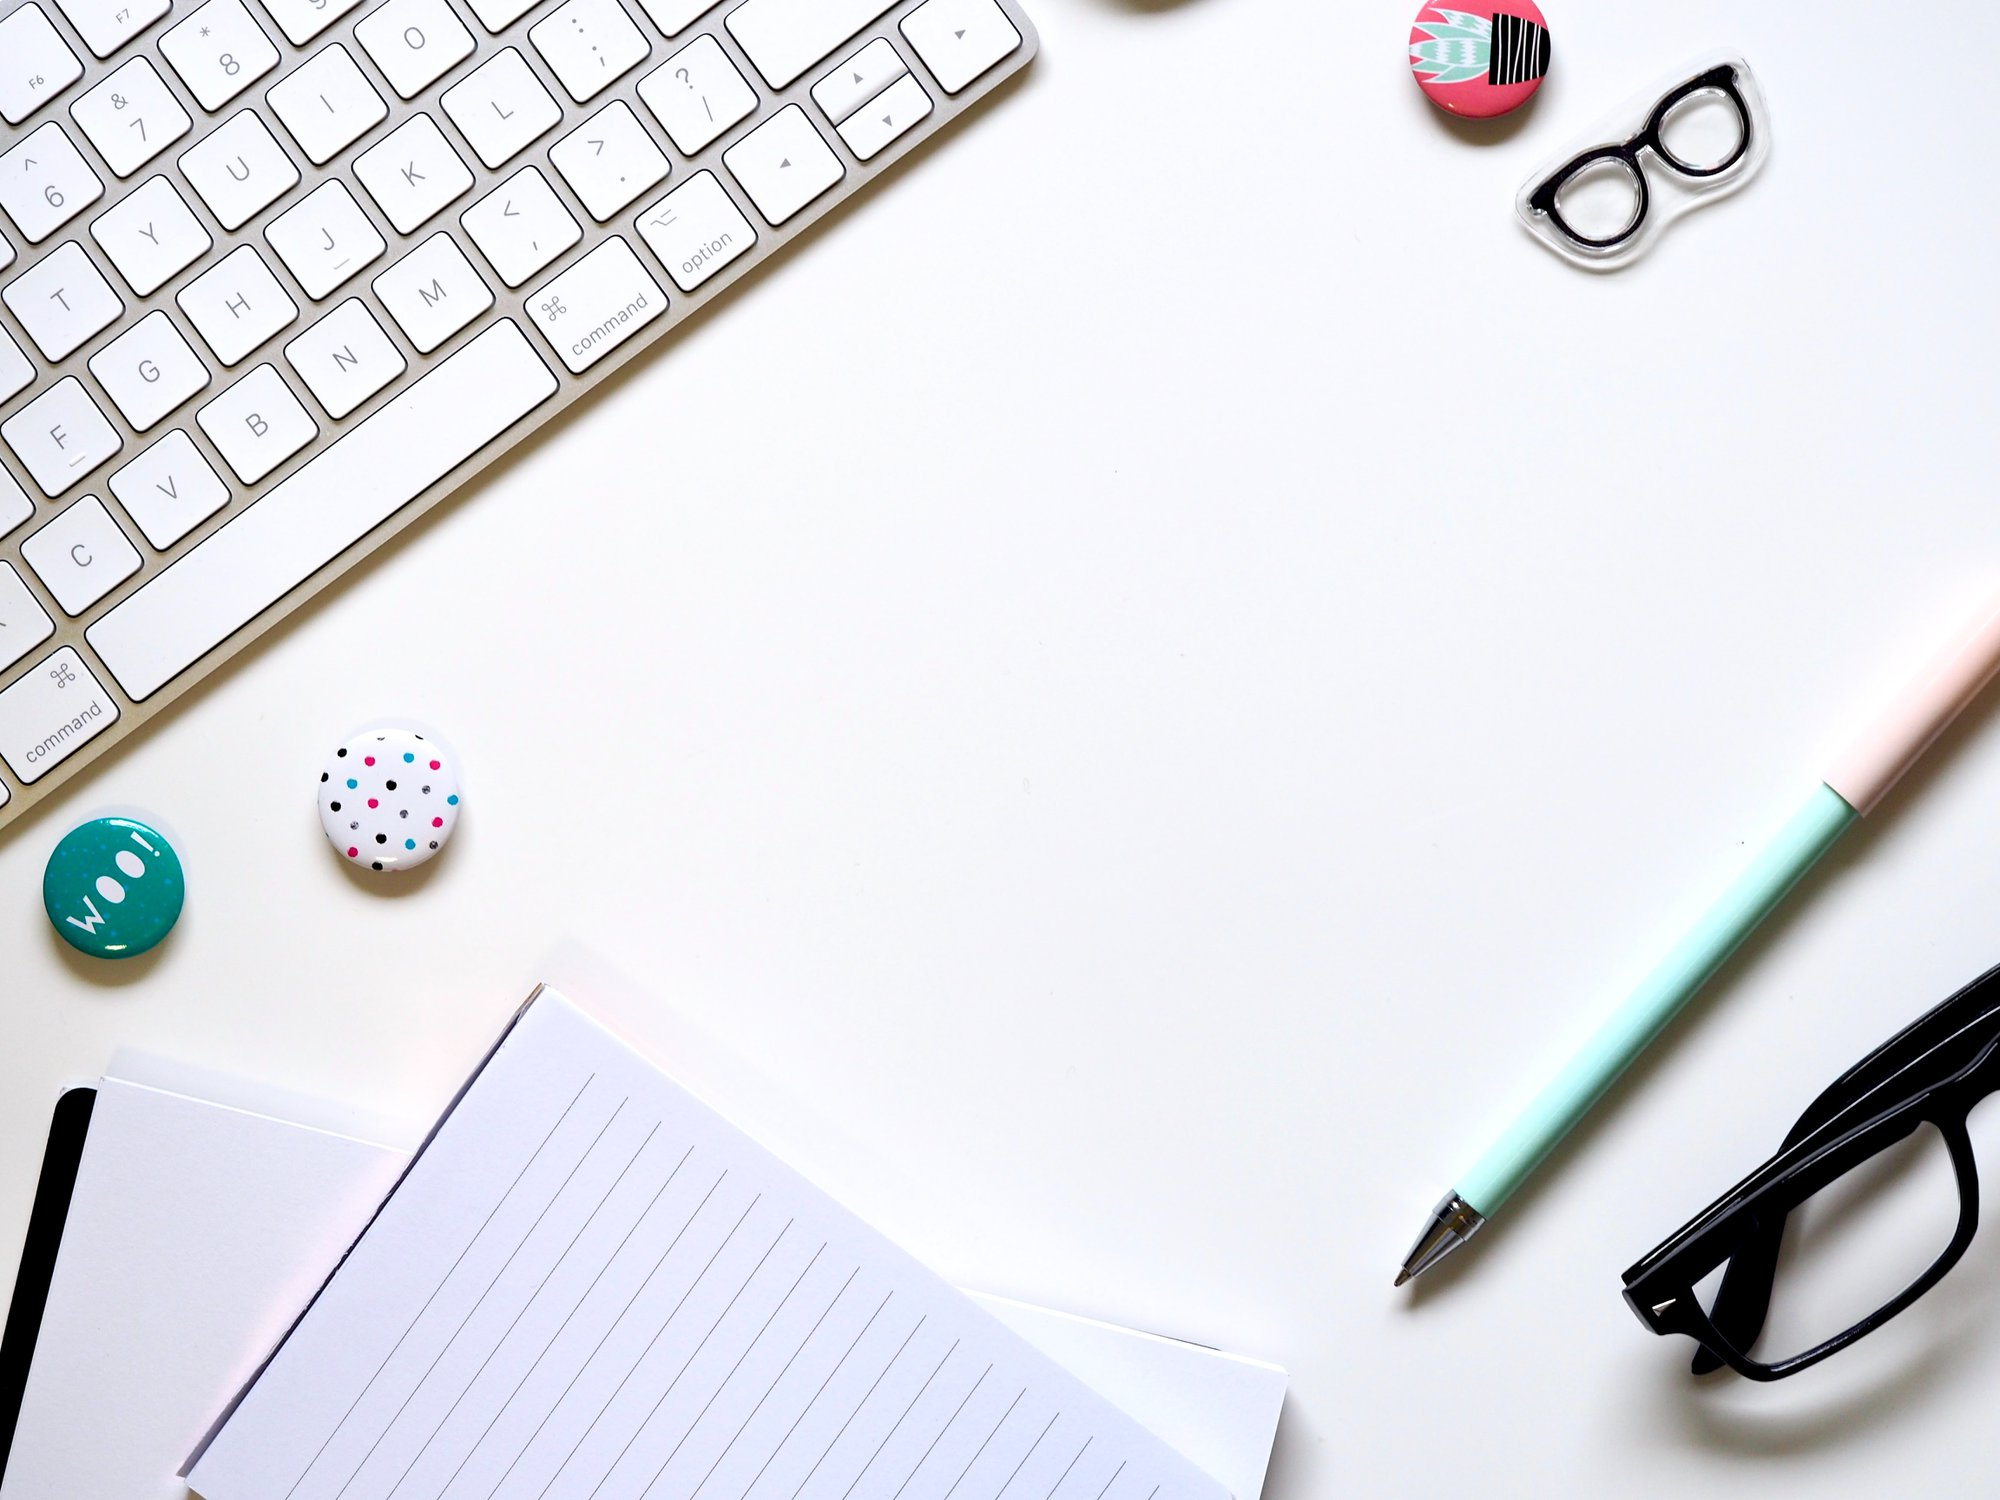 Gastblog Angélique Dupré: 6 tips voor freelancers en solo-ondernemers